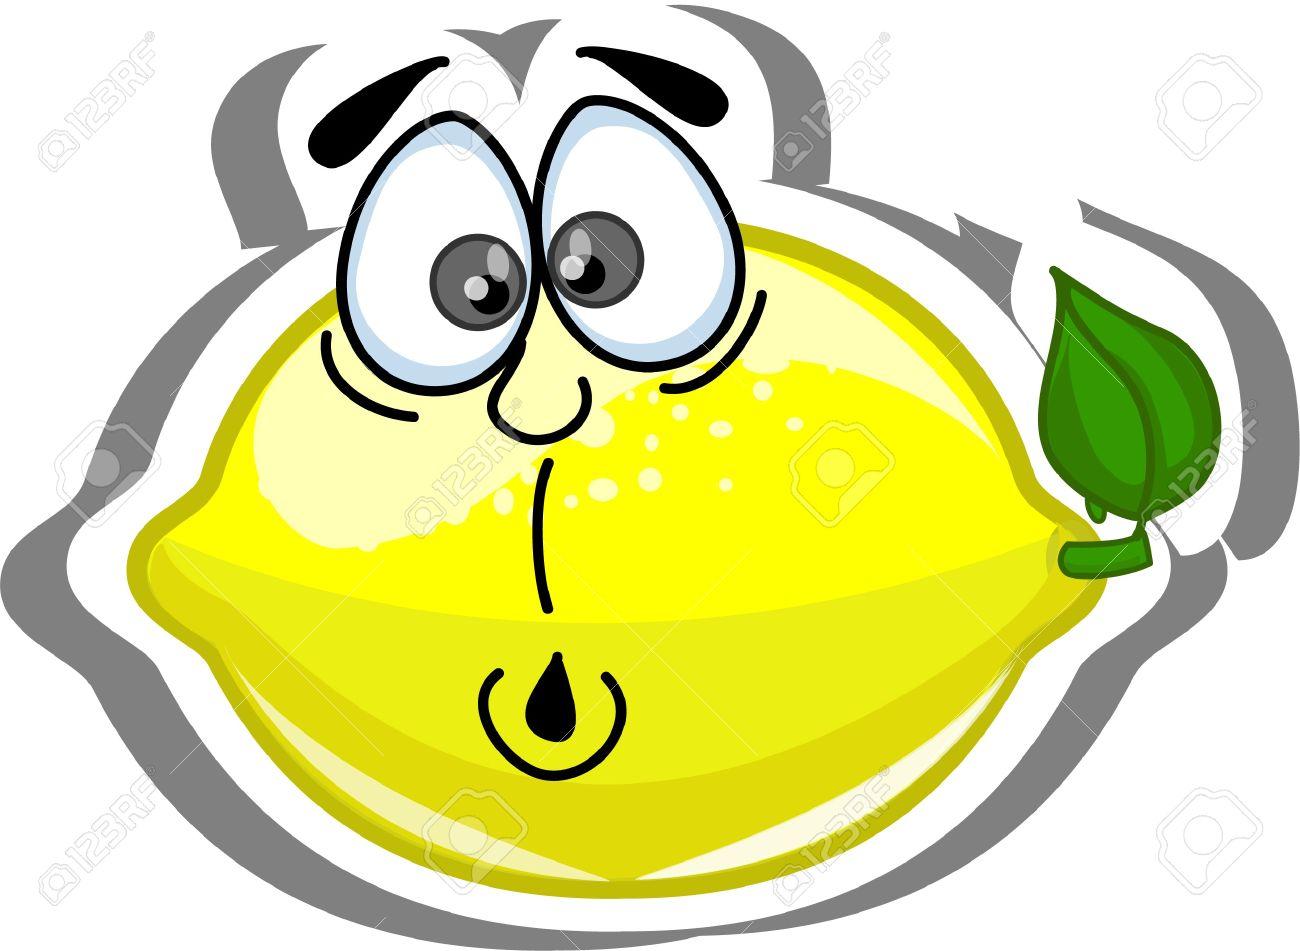 cartoon lemon royalty free cliparts vectors and stock illustration rh 123rf com cartoon monsters for kids cartoon monsters for kids